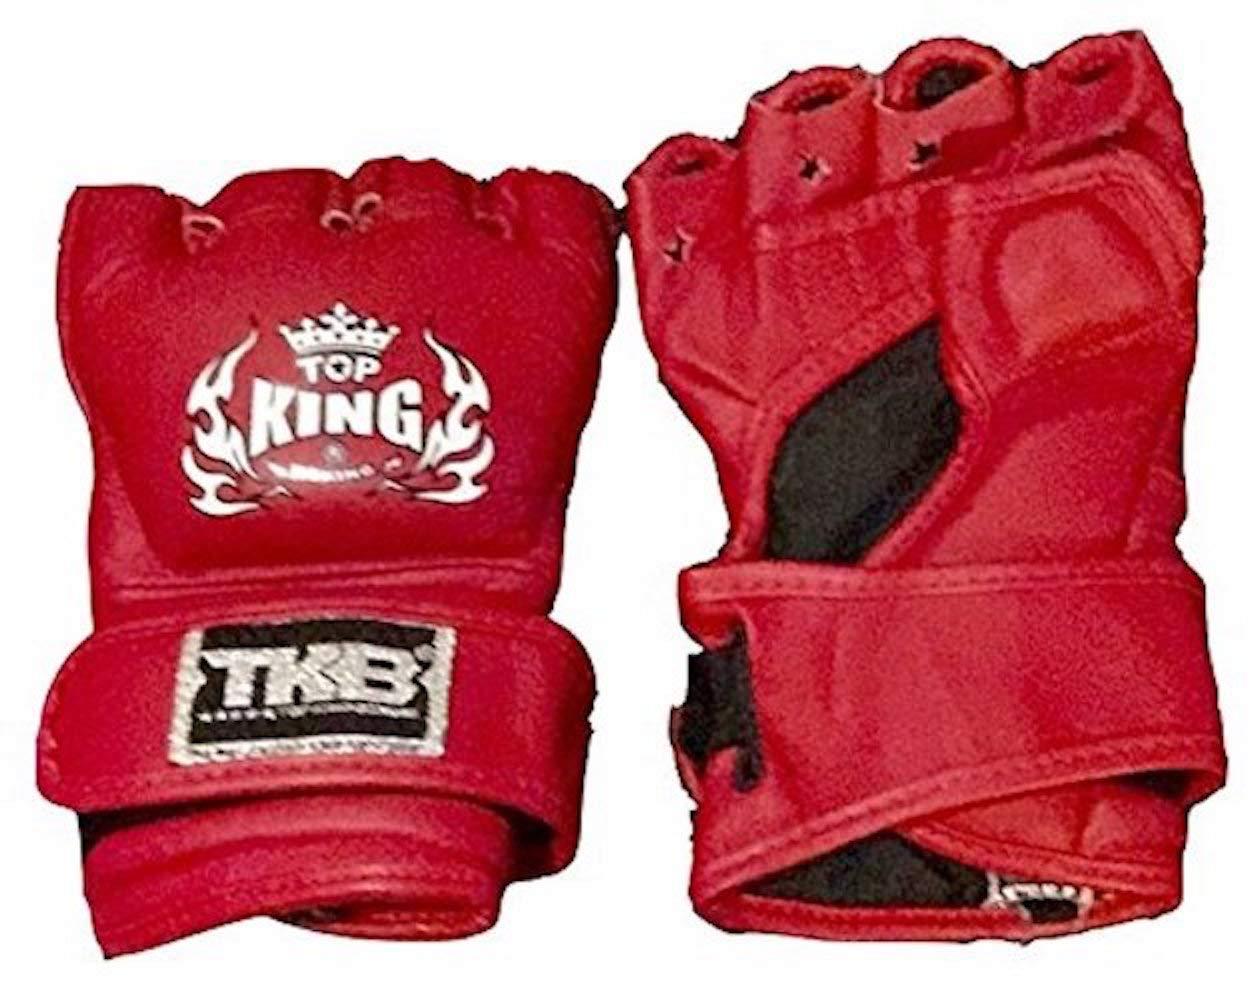 Top King 'Gants de lutte' Ultimate '– Tkggu-333–Rouge